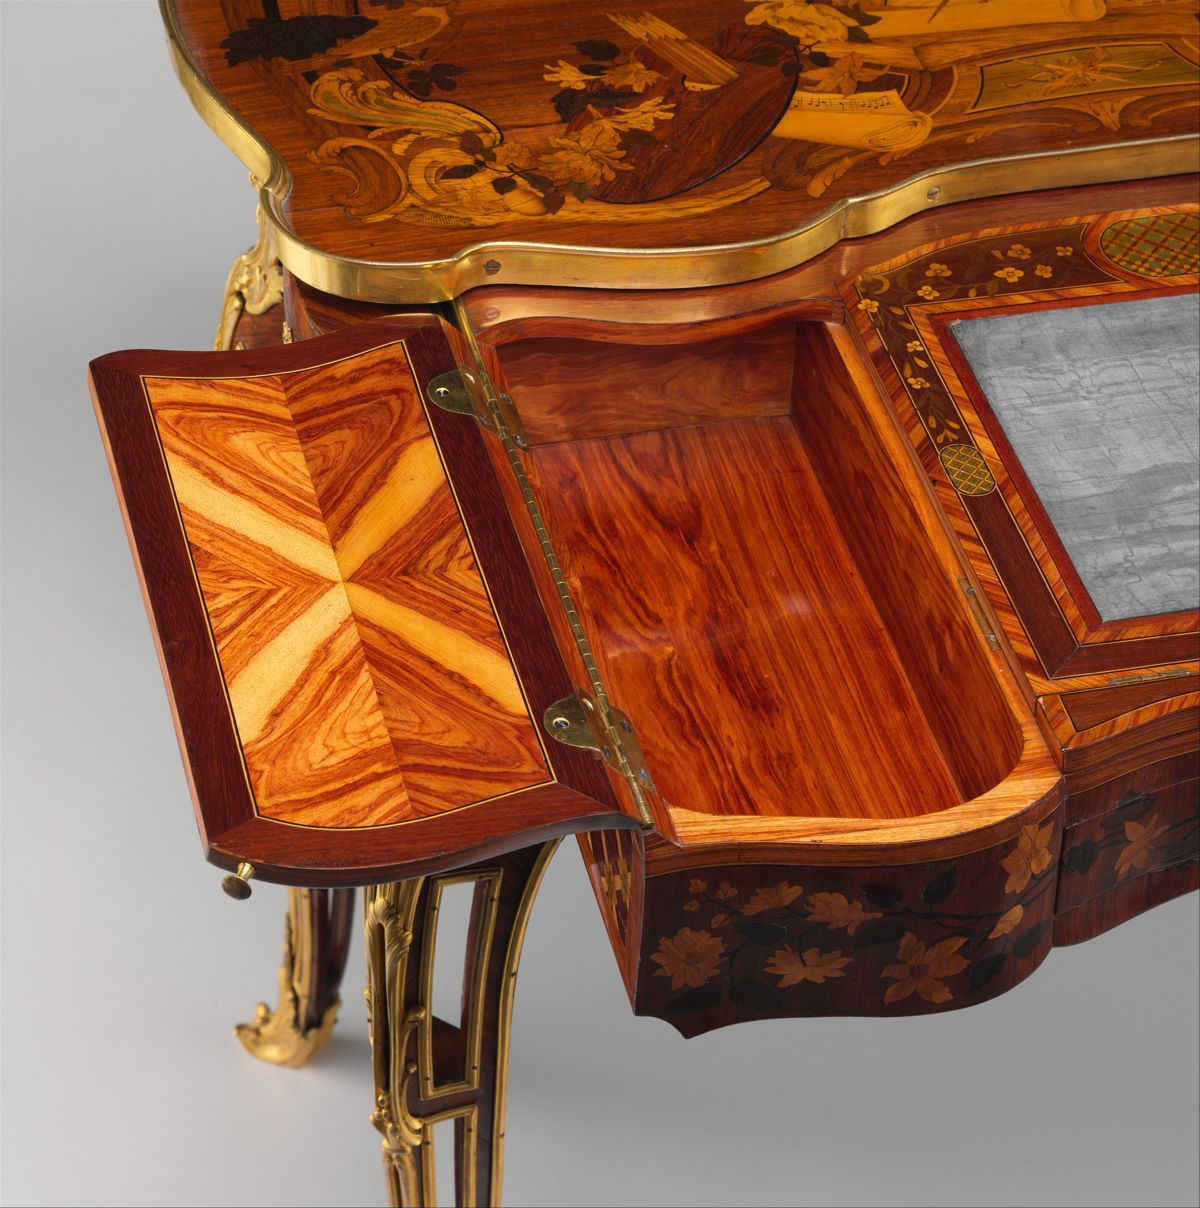 Best Mechanical Table Jean François Oeben French Born 400 x 300